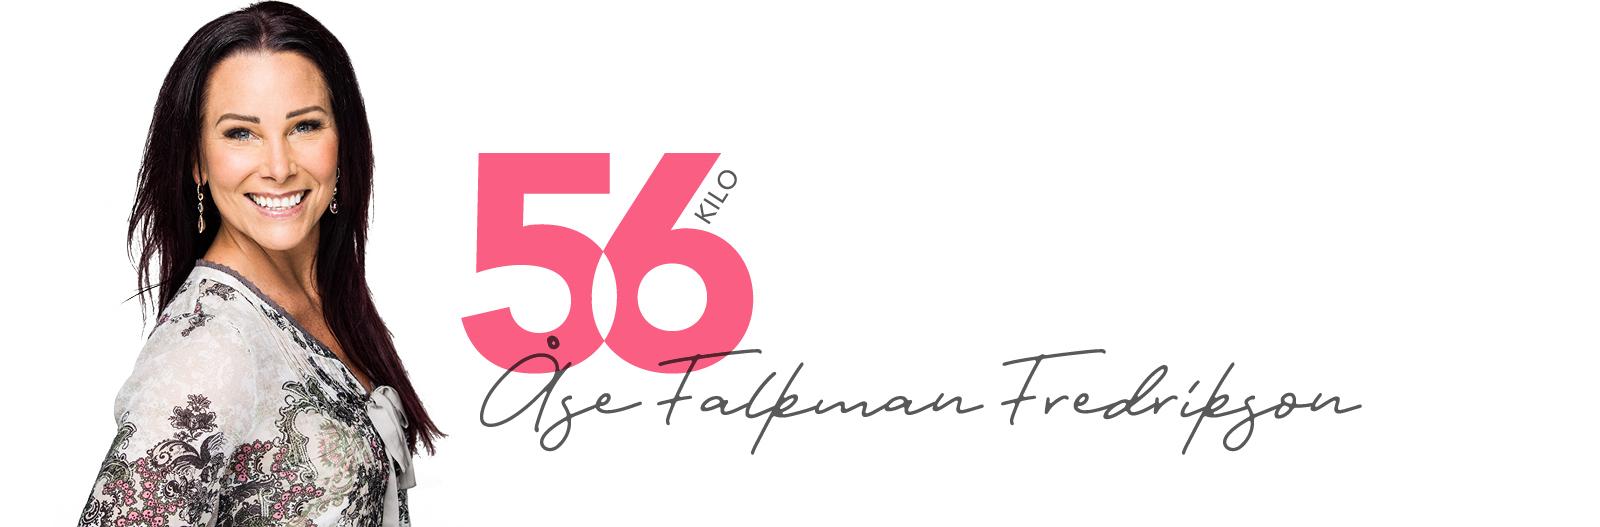 56kilo.se – Wellness, lchf, keto & livsstil!